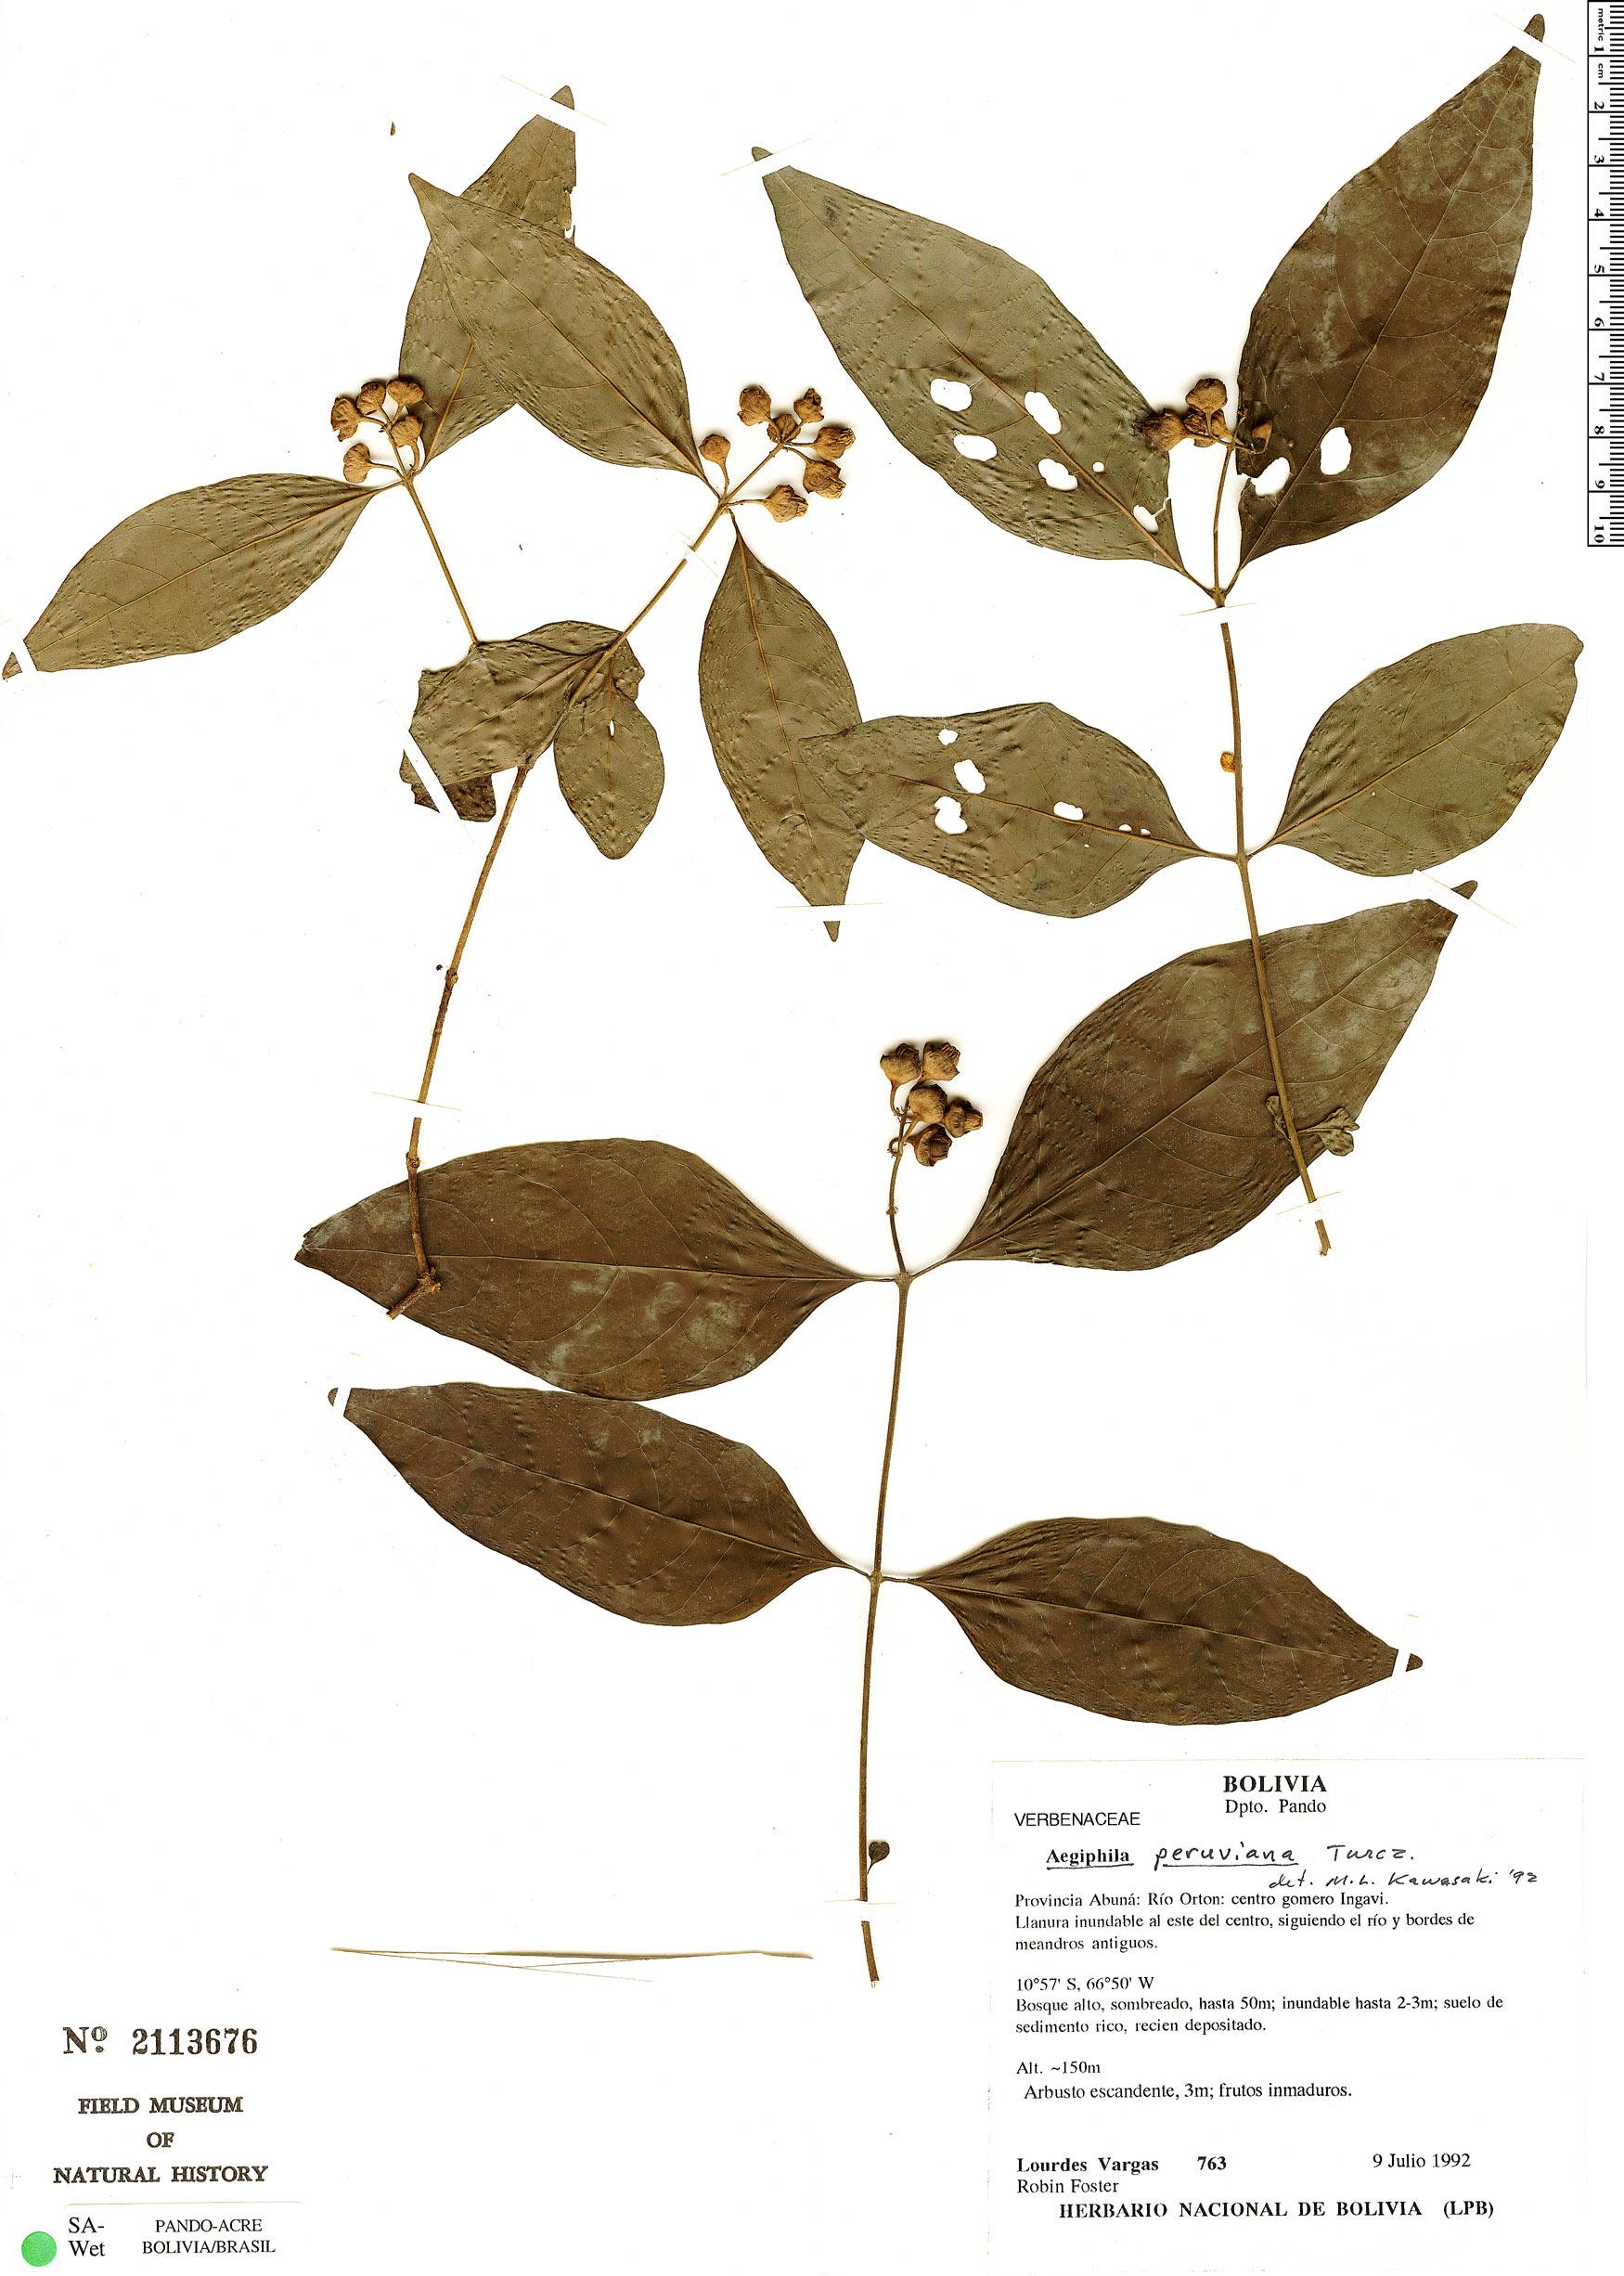 Espécimen: Aegiphila peruviana